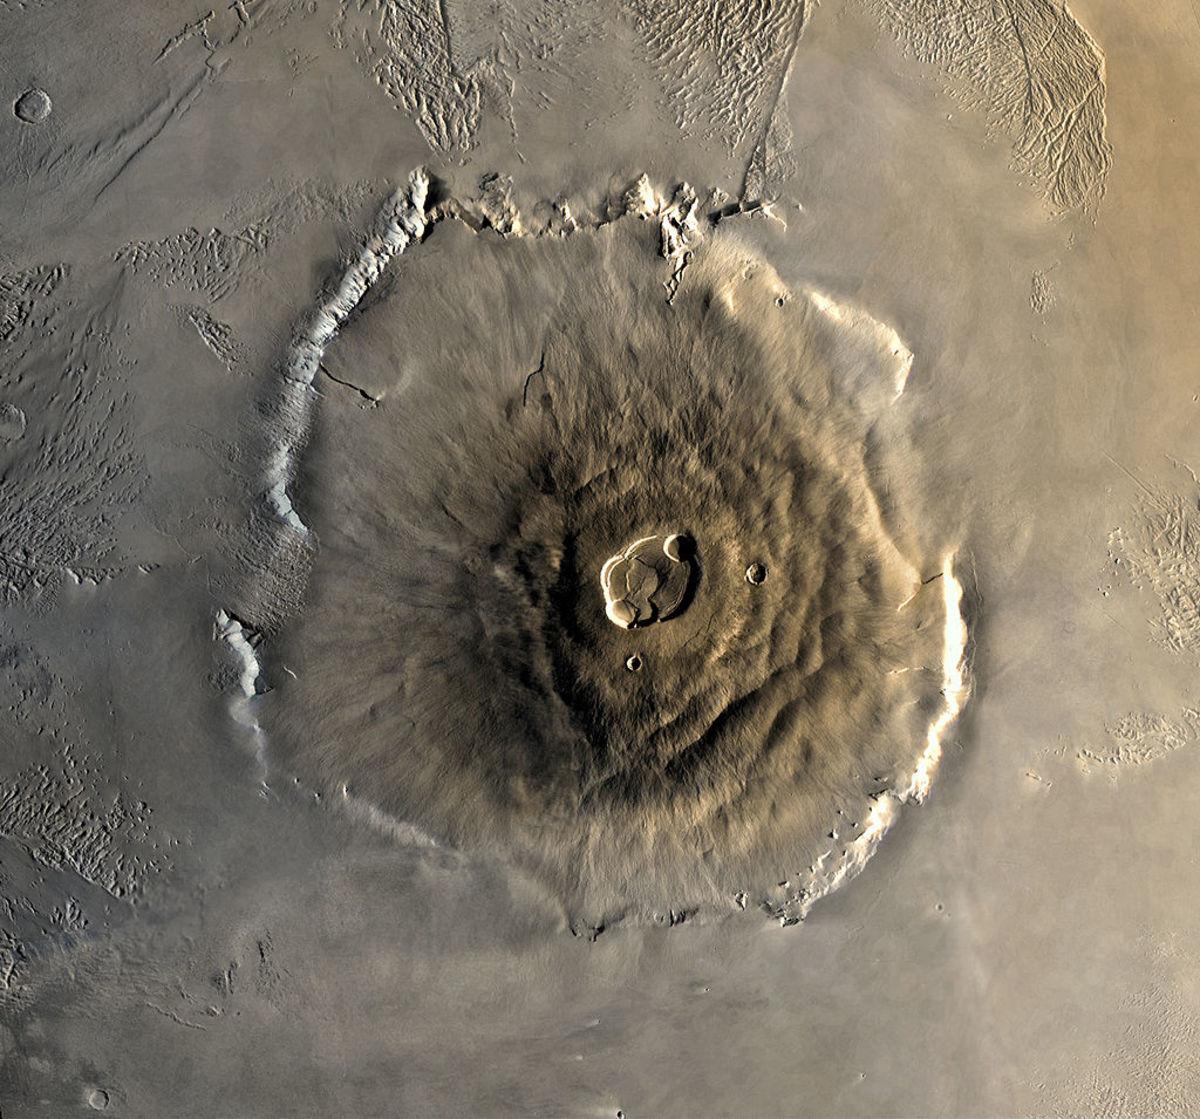 Olympus Mons: dwarfs Mount Everest